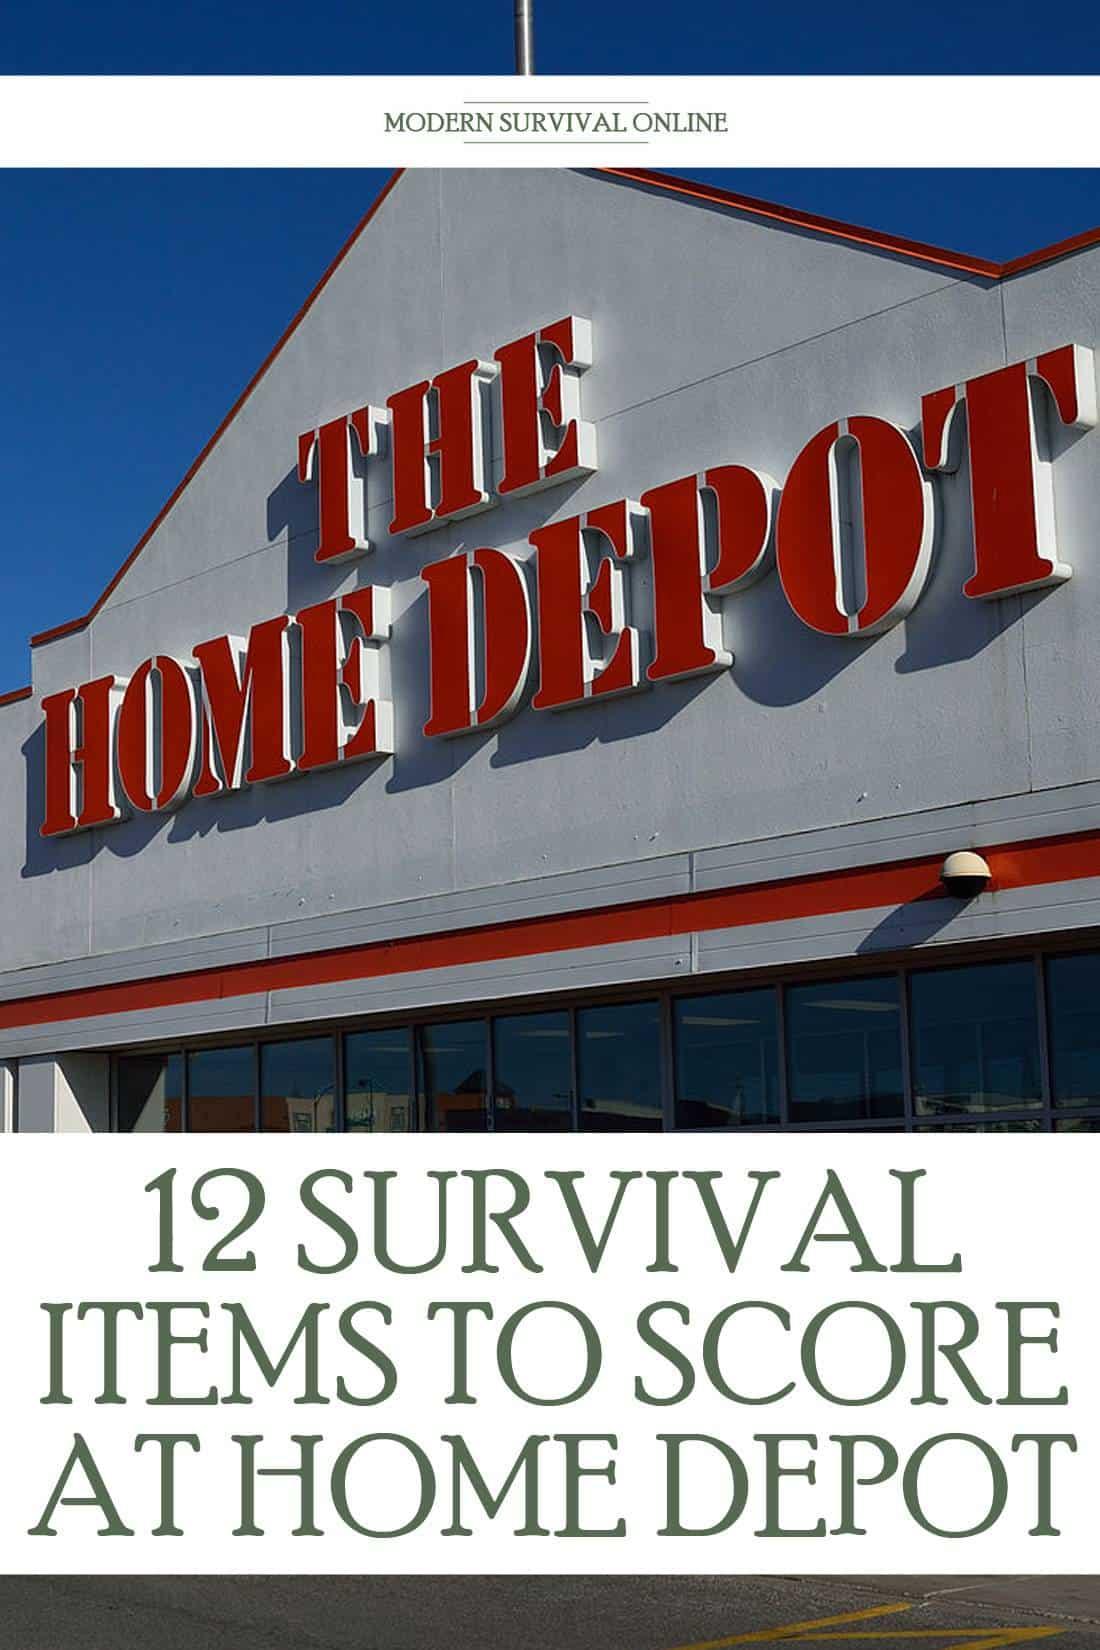 home depot pin image